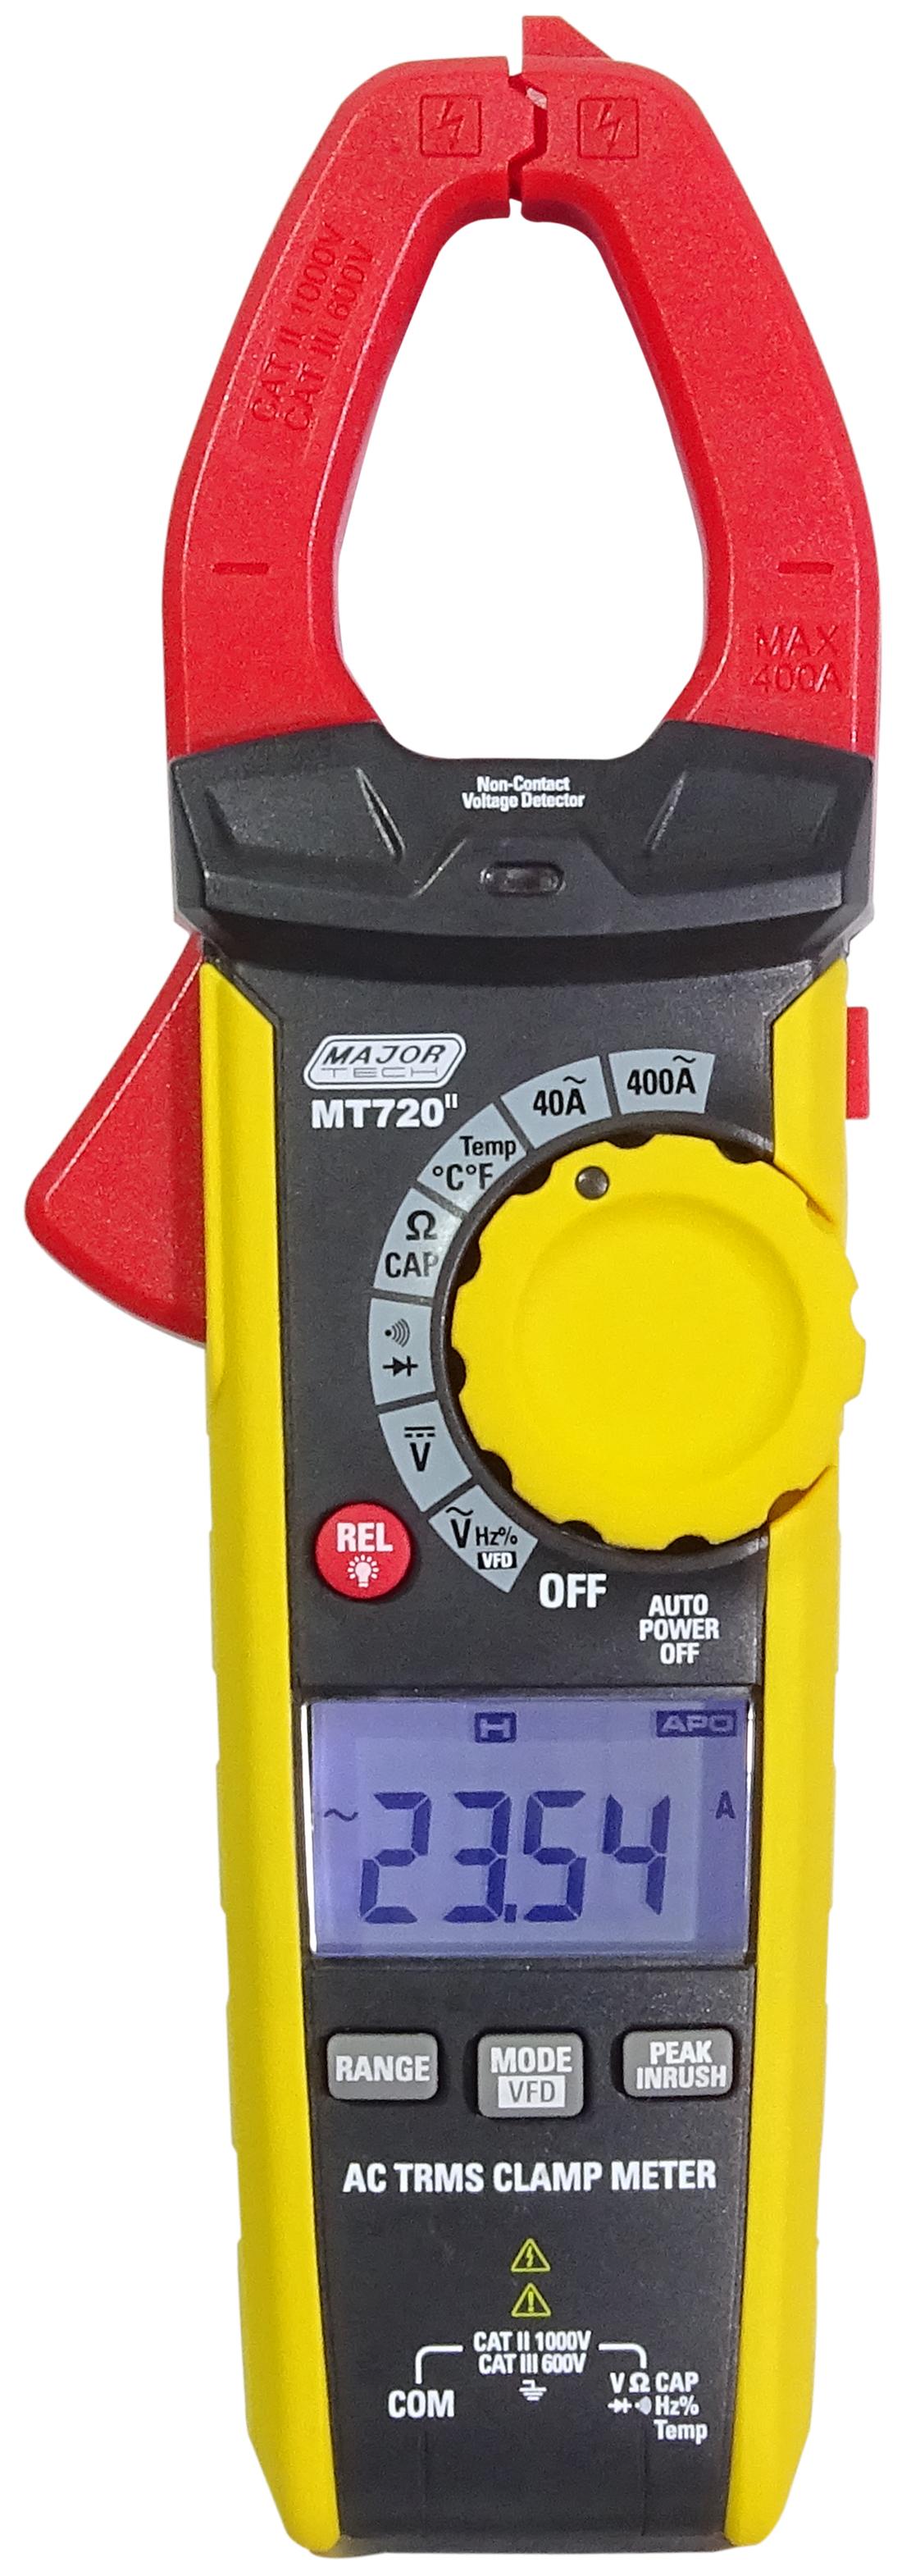 400A AC TRMS Clamp Meter (MT720) - Major Tech